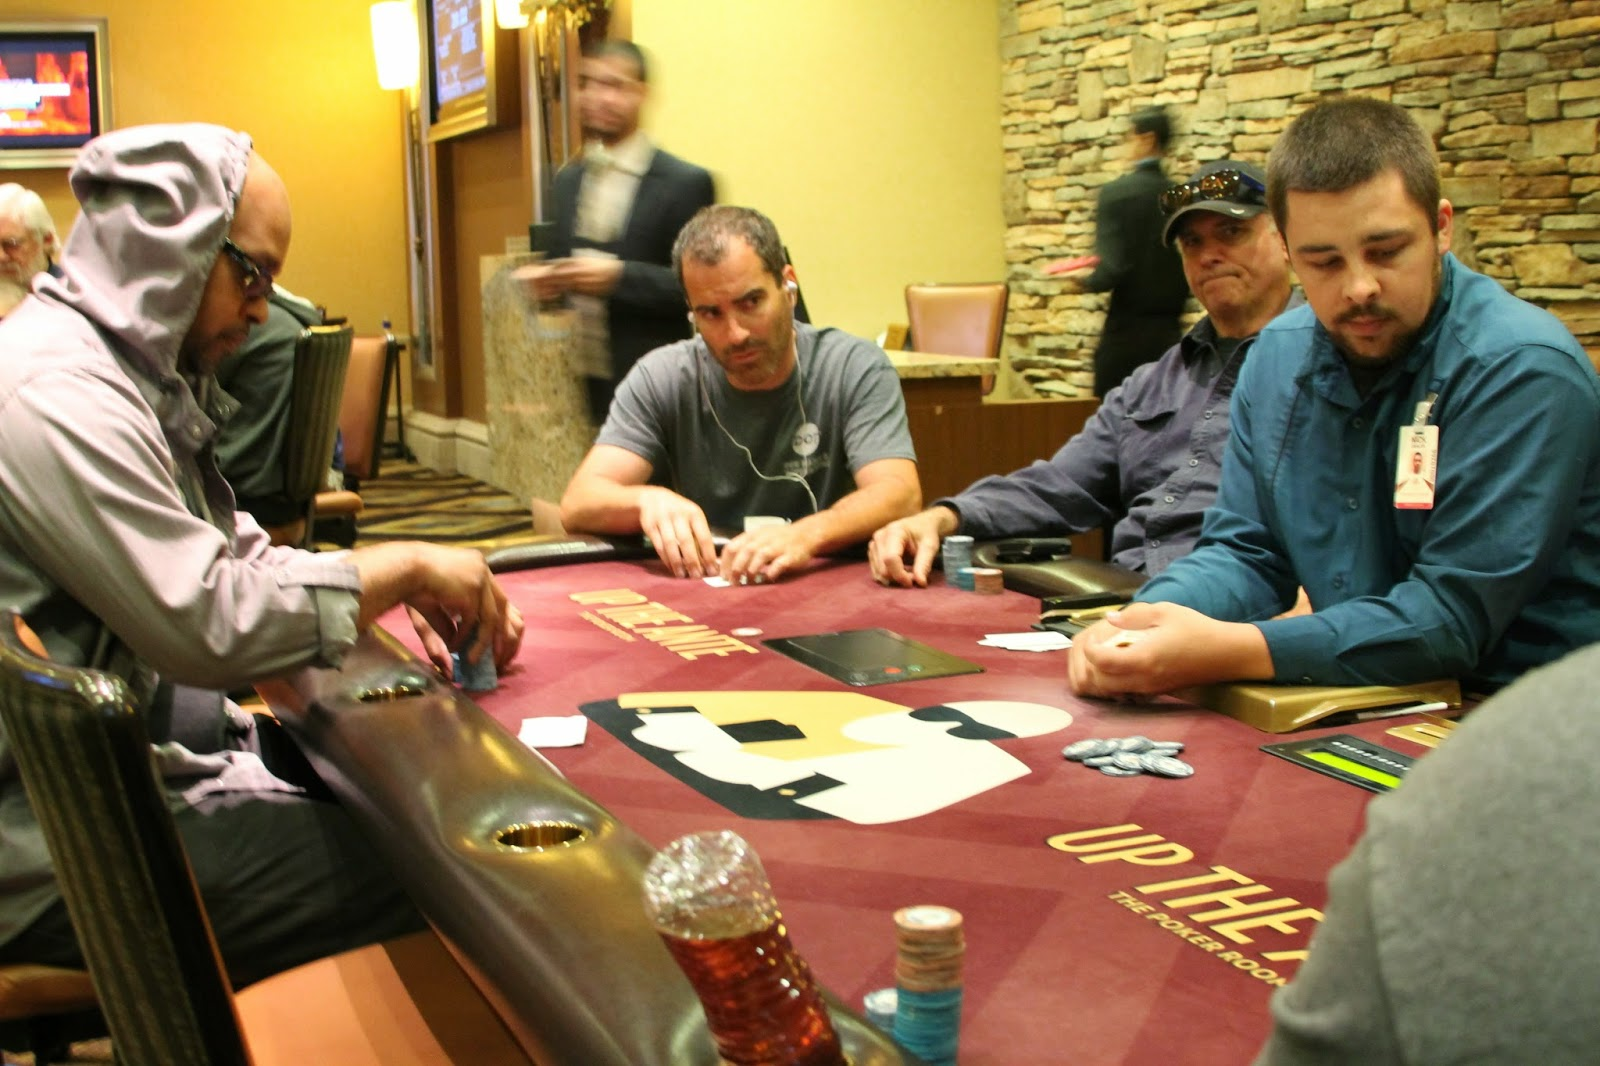 Thunder valley casino poker weather at chukchansi casino